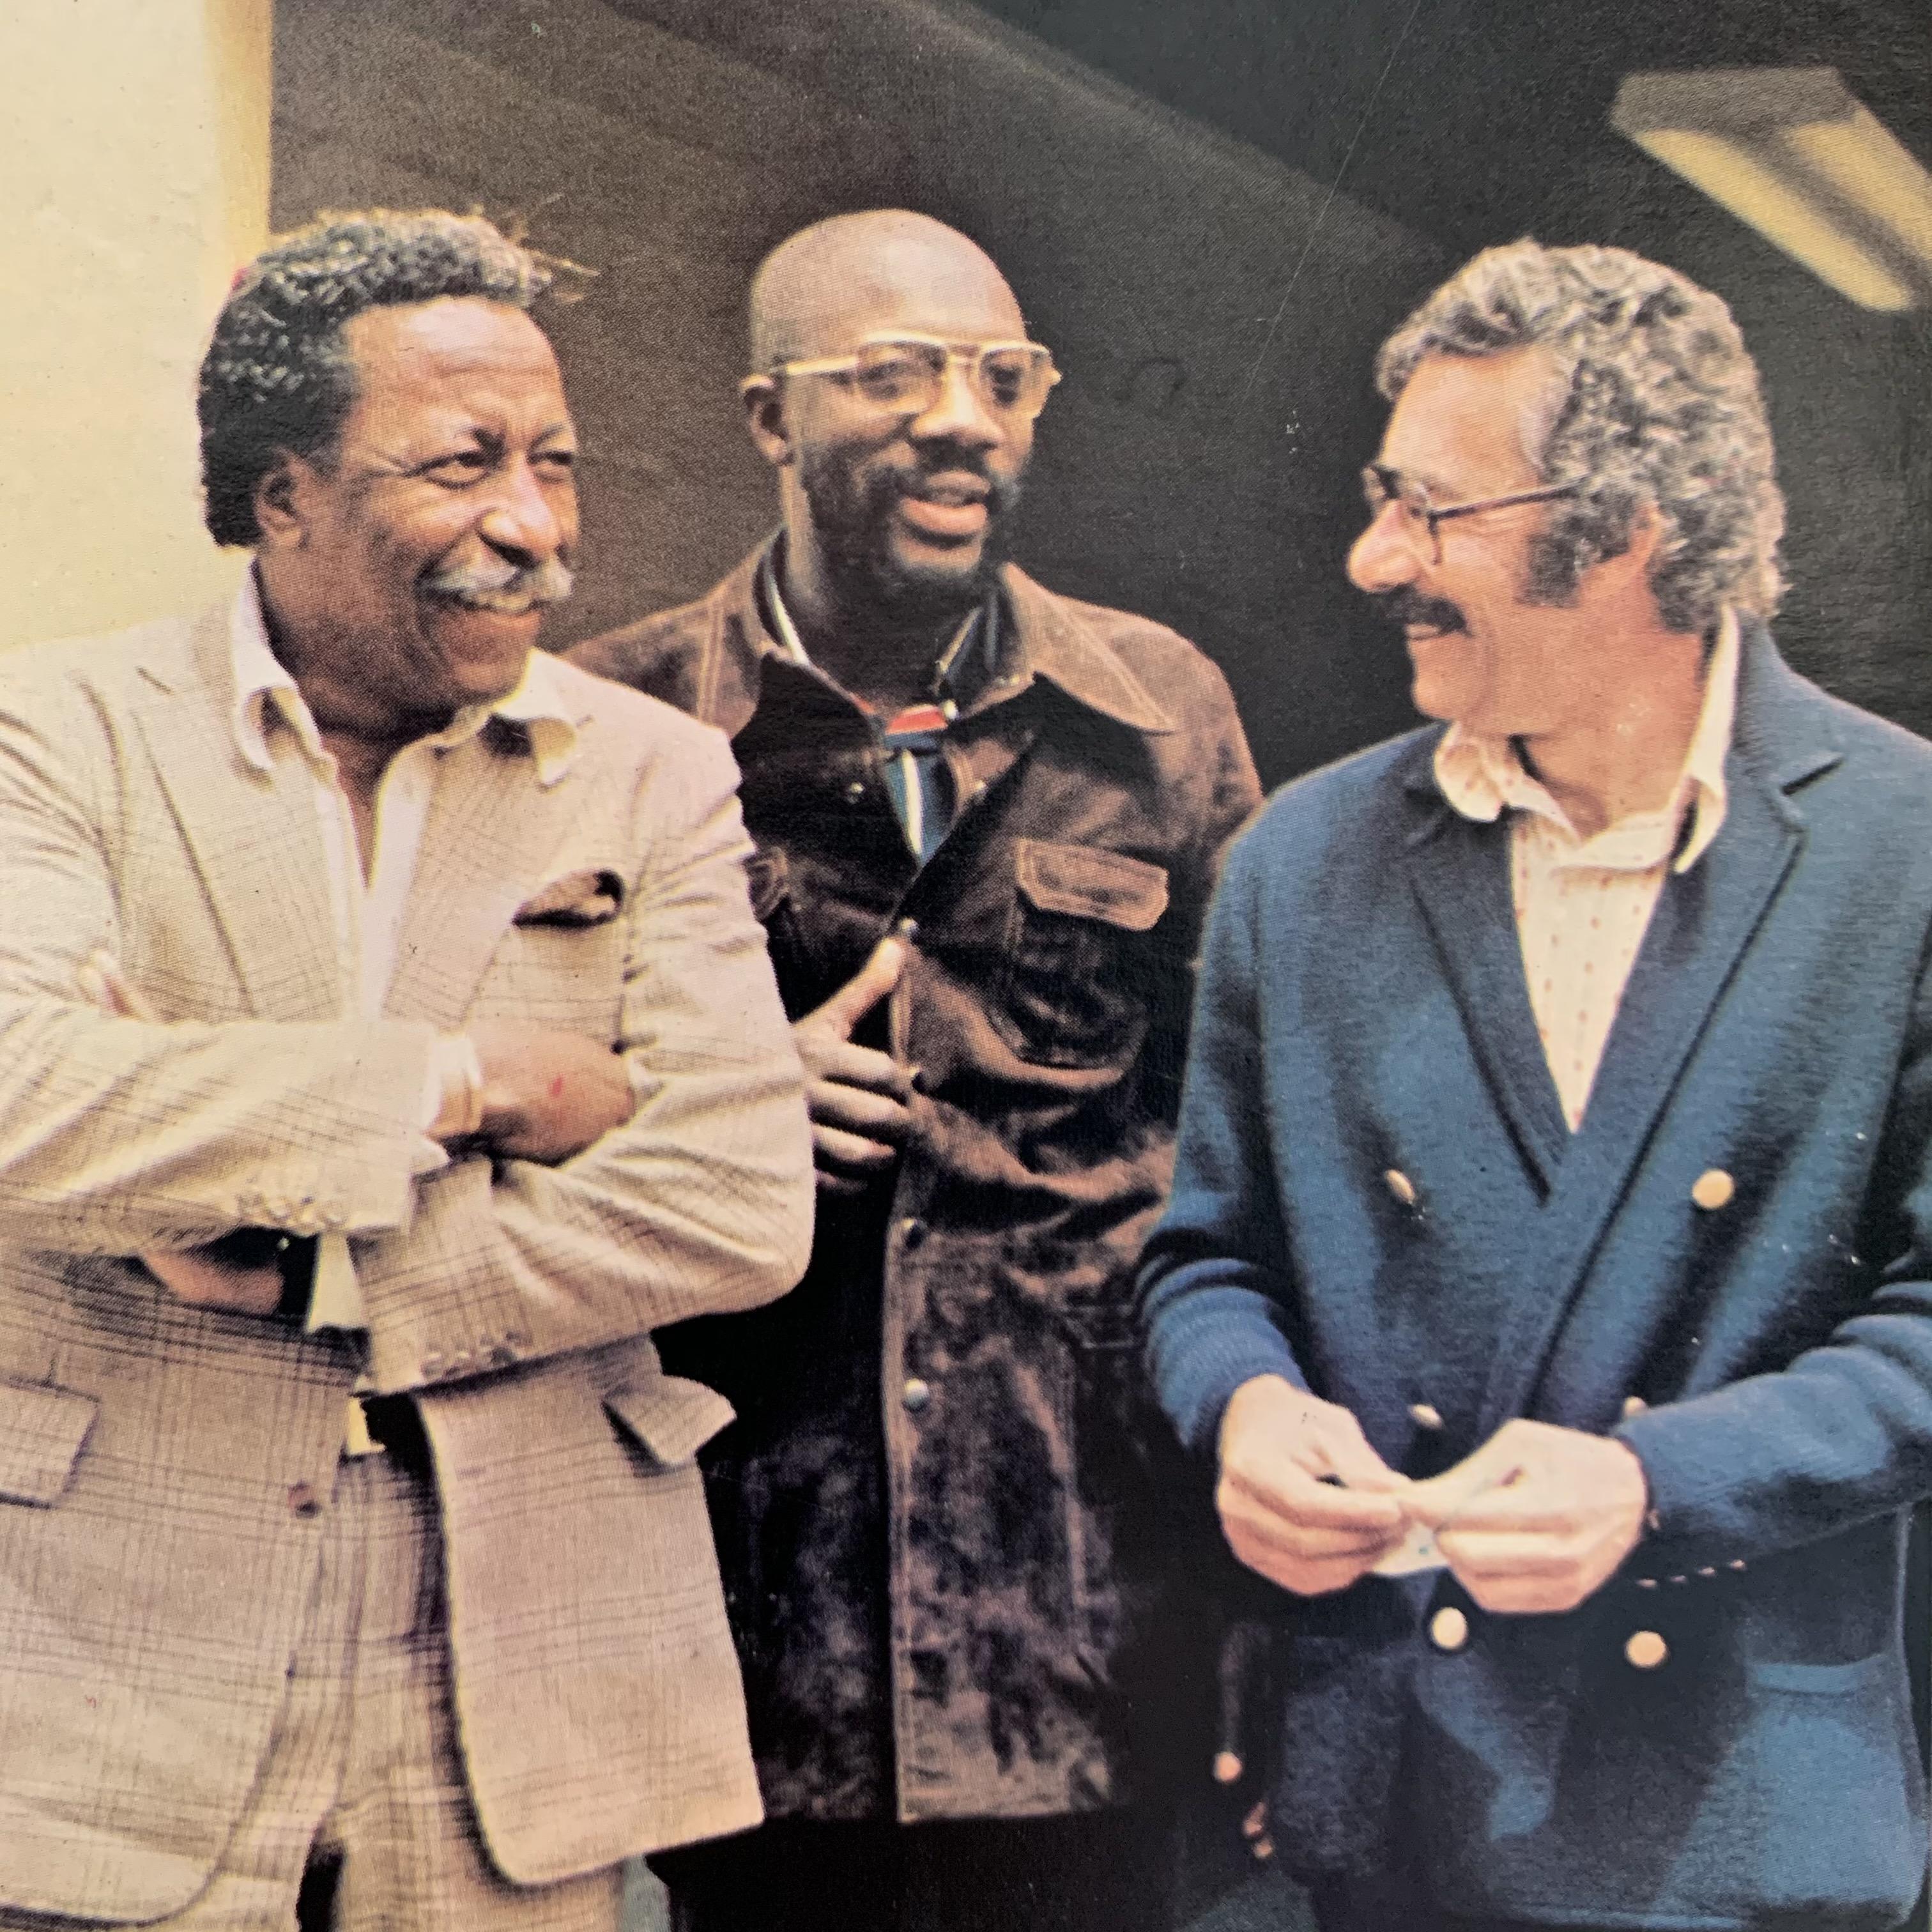 Caption: Gordon Parks, Isaac Hayes, Earnest Tidyman, Credit: Courtesy of MGM